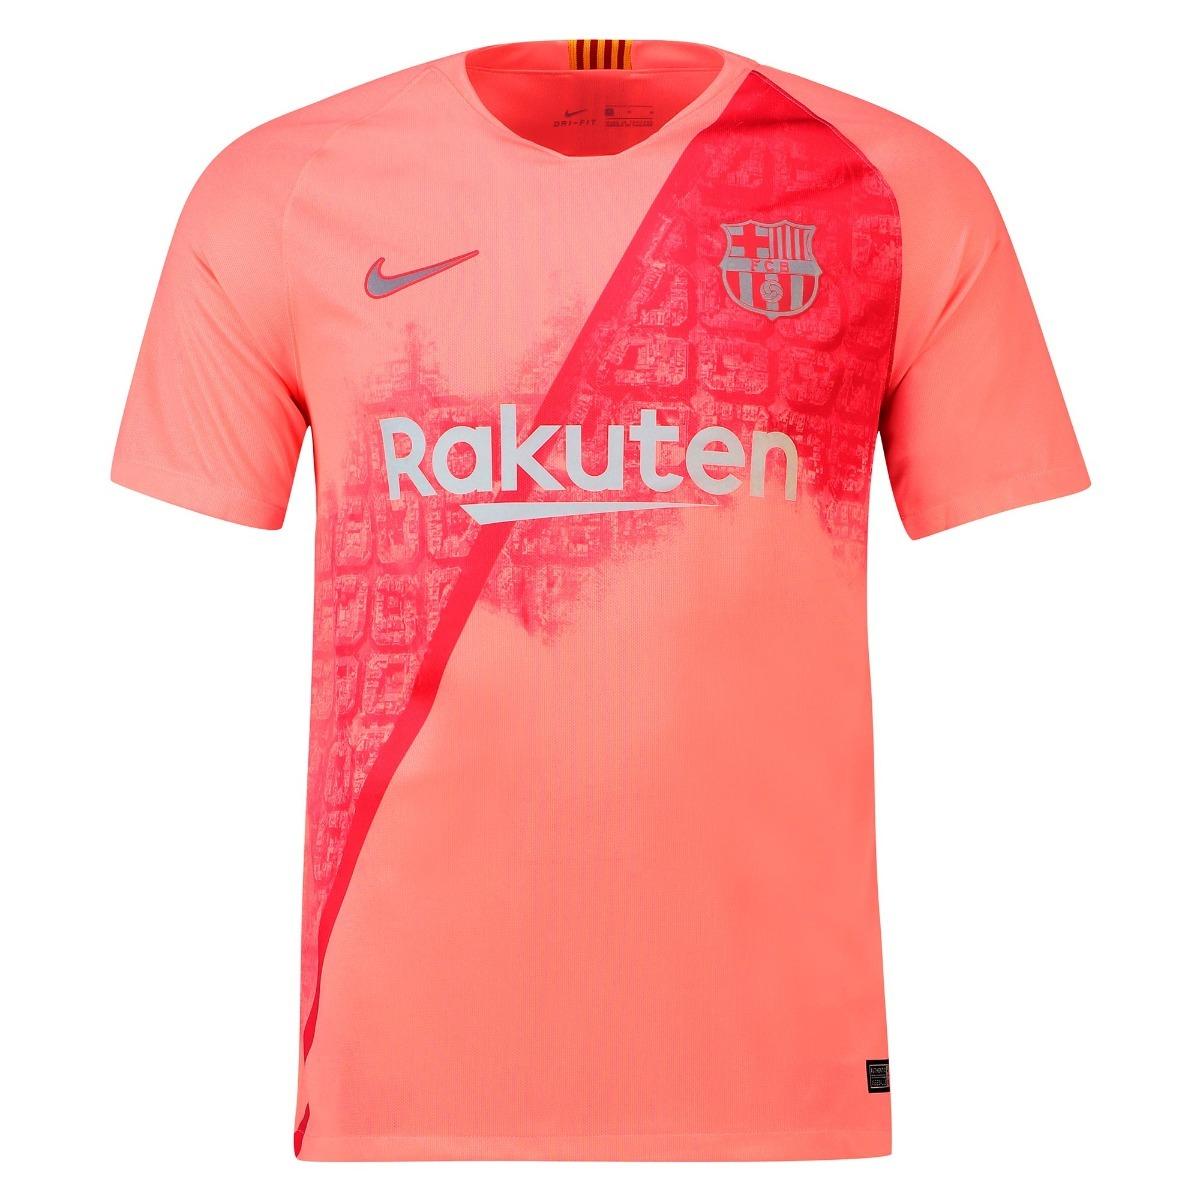 camisa barcelona rakuten rosa produto n brasil 18 19 r 147 00 em mercado livre. Black Bedroom Furniture Sets. Home Design Ideas